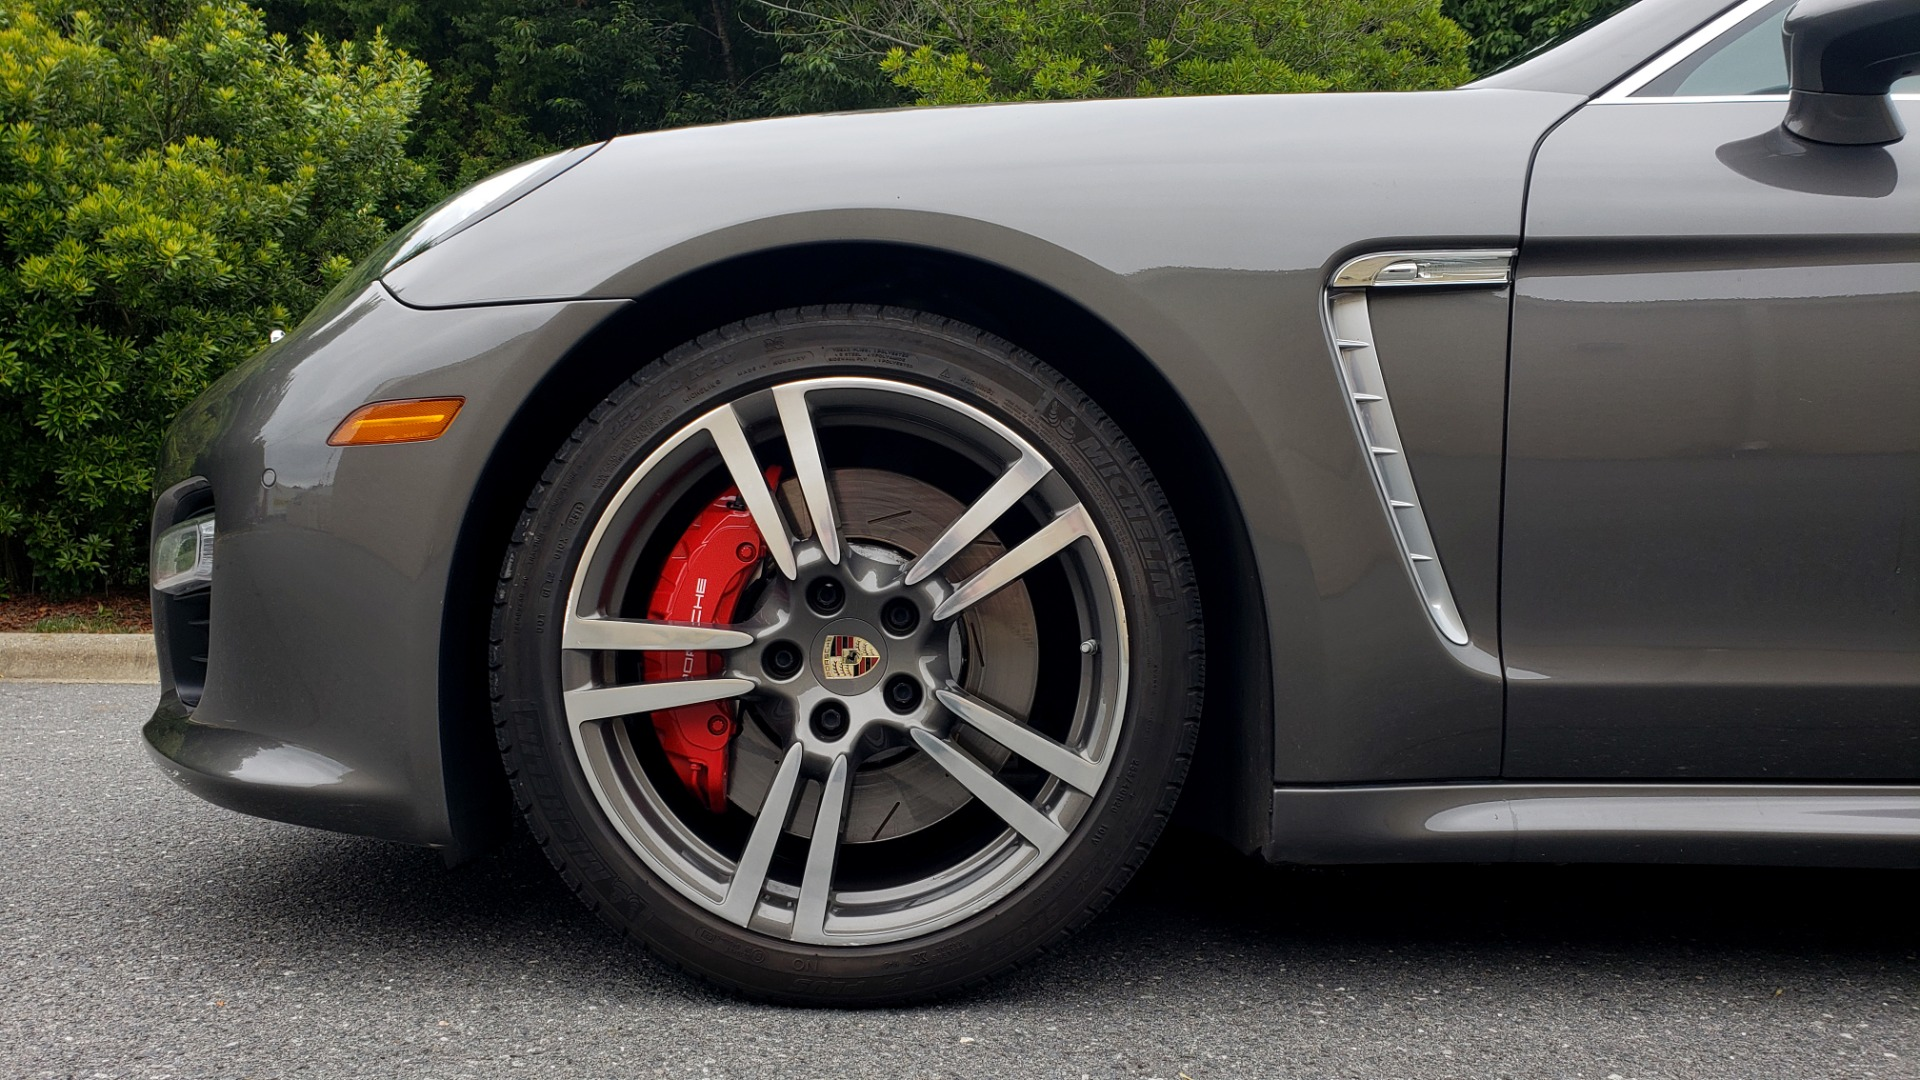 Used 2013 Porsche PANAMERA TURBO 4.8L V8 / AWD / NAV / SUNROOF / LCA / PARK ASST / BURMESTER for sale $45,995 at Formula Imports in Charlotte NC 28227 88